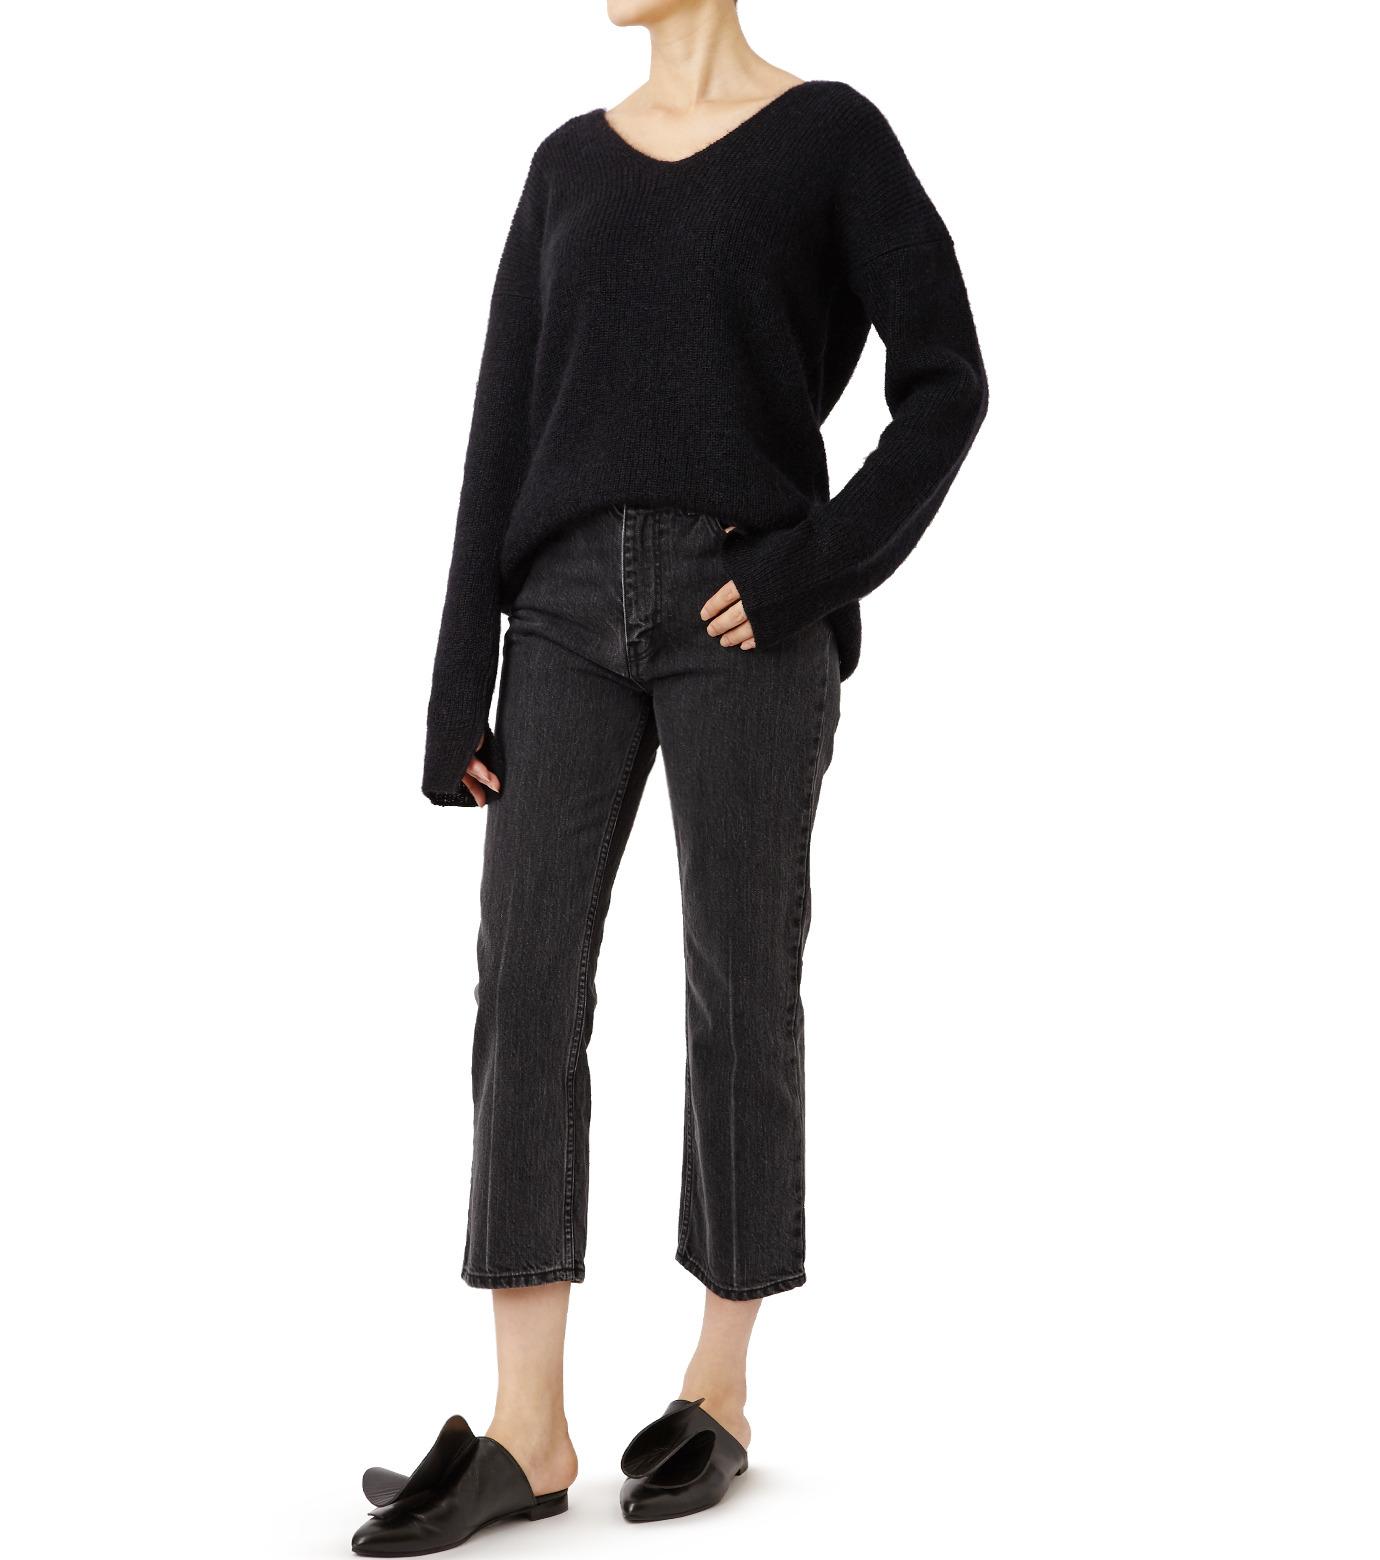 LE CIEL BLEU(ルシェルブルー)のセンタープレスデニムパンツ-BLACK(パンツ/pants)-18A68515 拡大詳細画像3